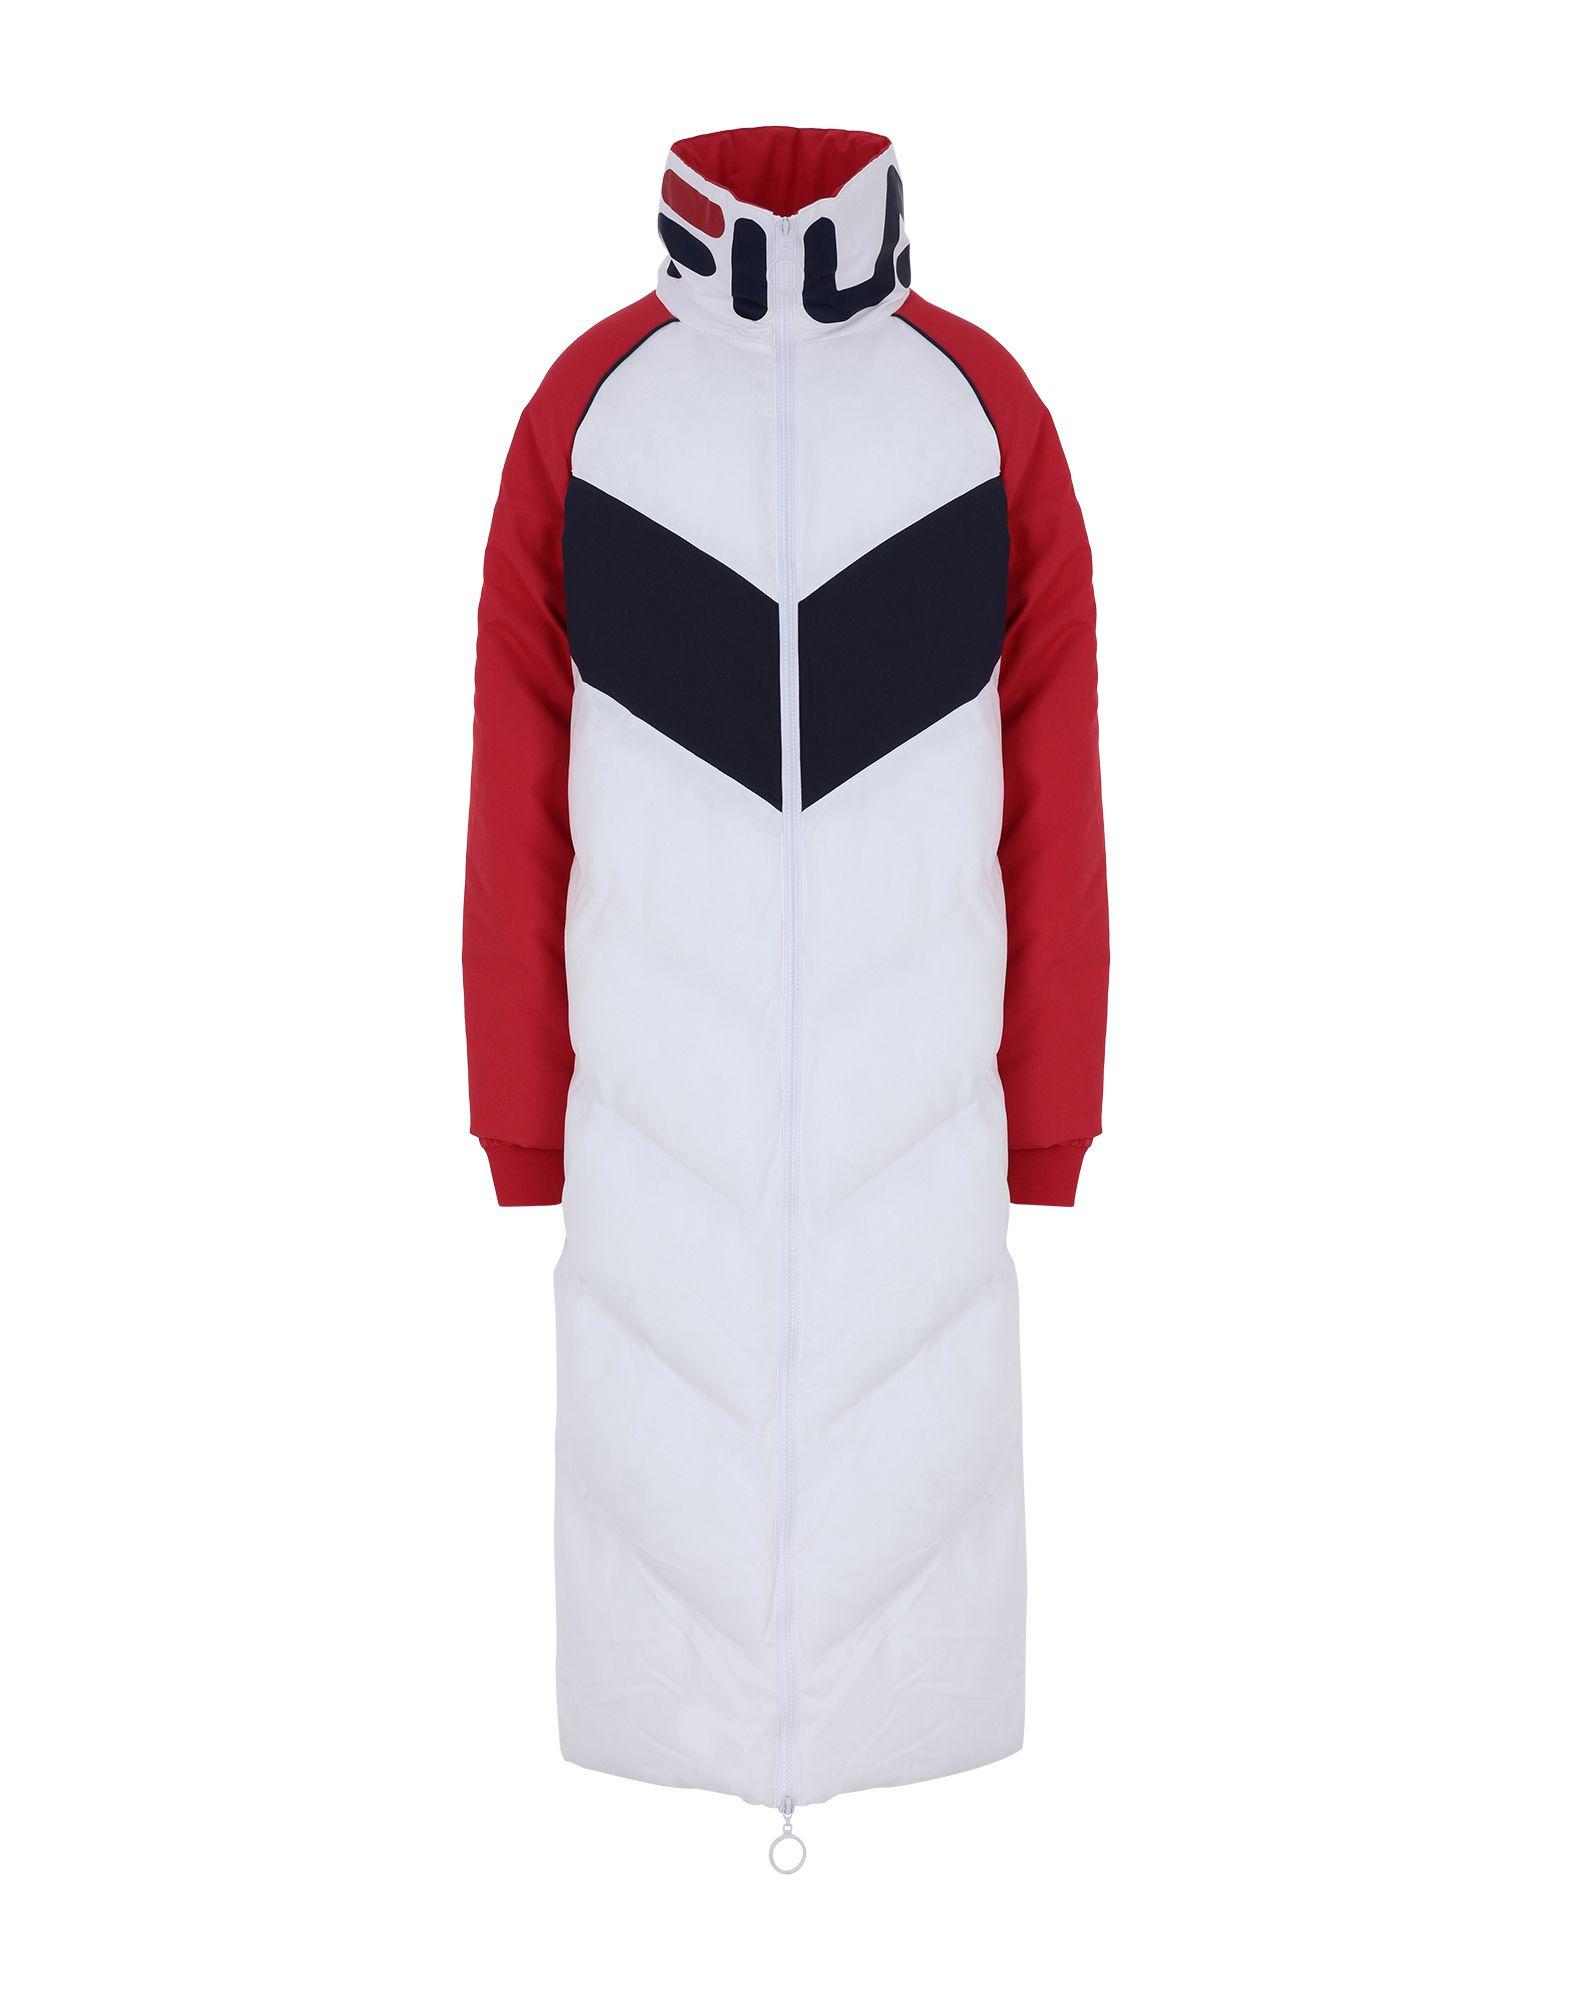 YOOX.COM(ユークス)《セール開催中》FILA HERITAGE レディース 合成繊維中綿アウター ホワイト S ポリエステル 100% KEON longline puffer jacket